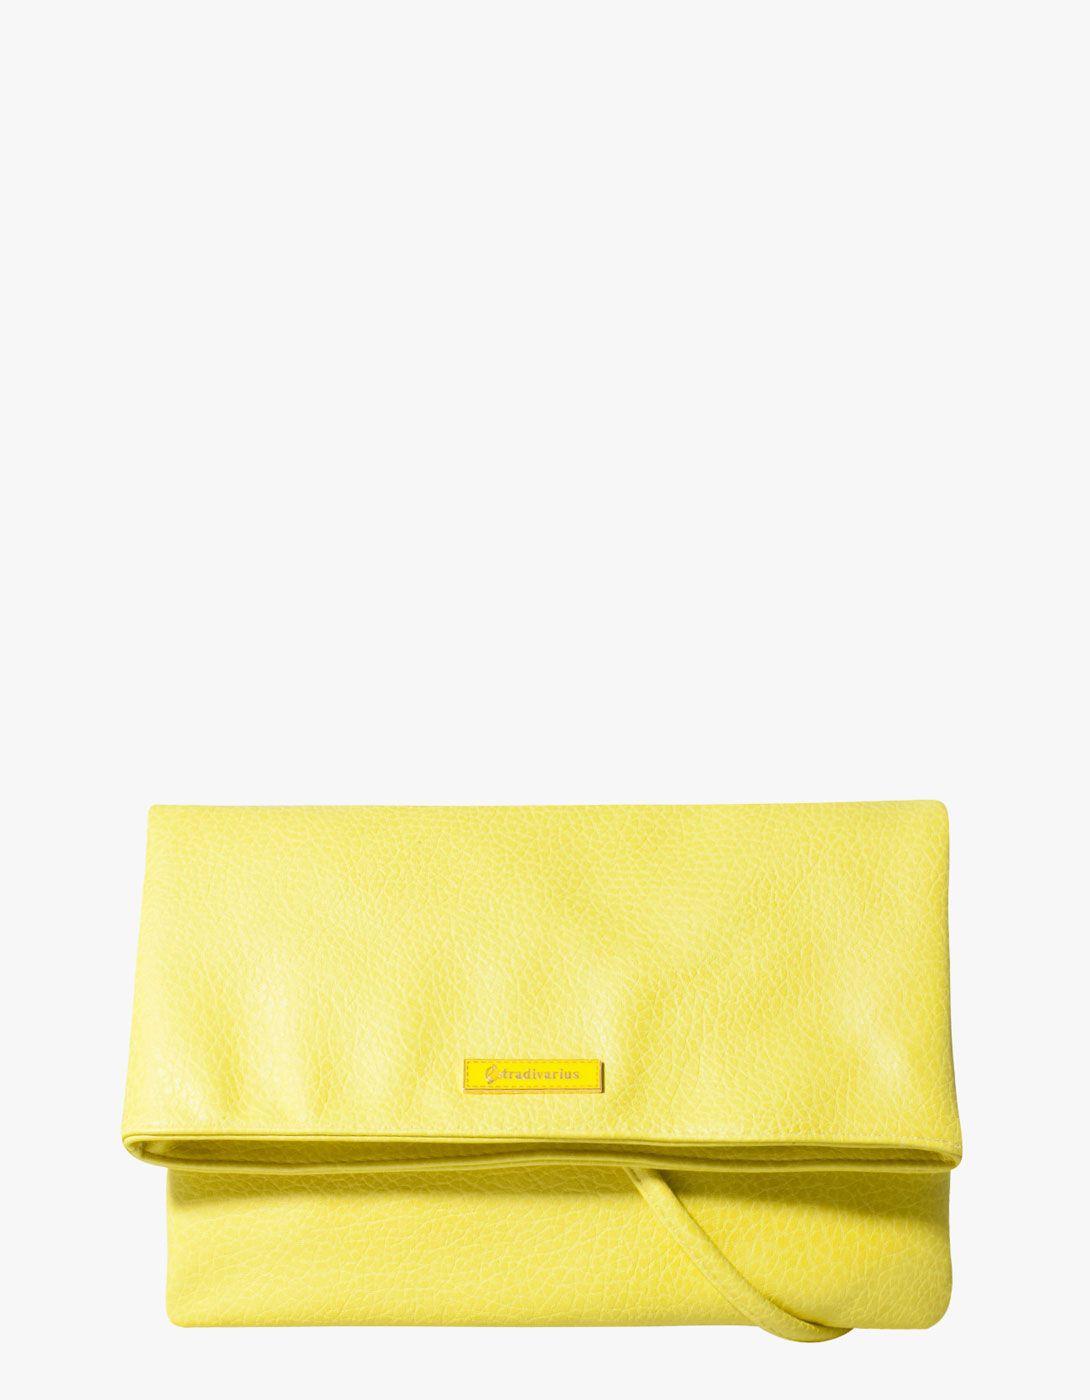 Neon handbag by Stradivarius